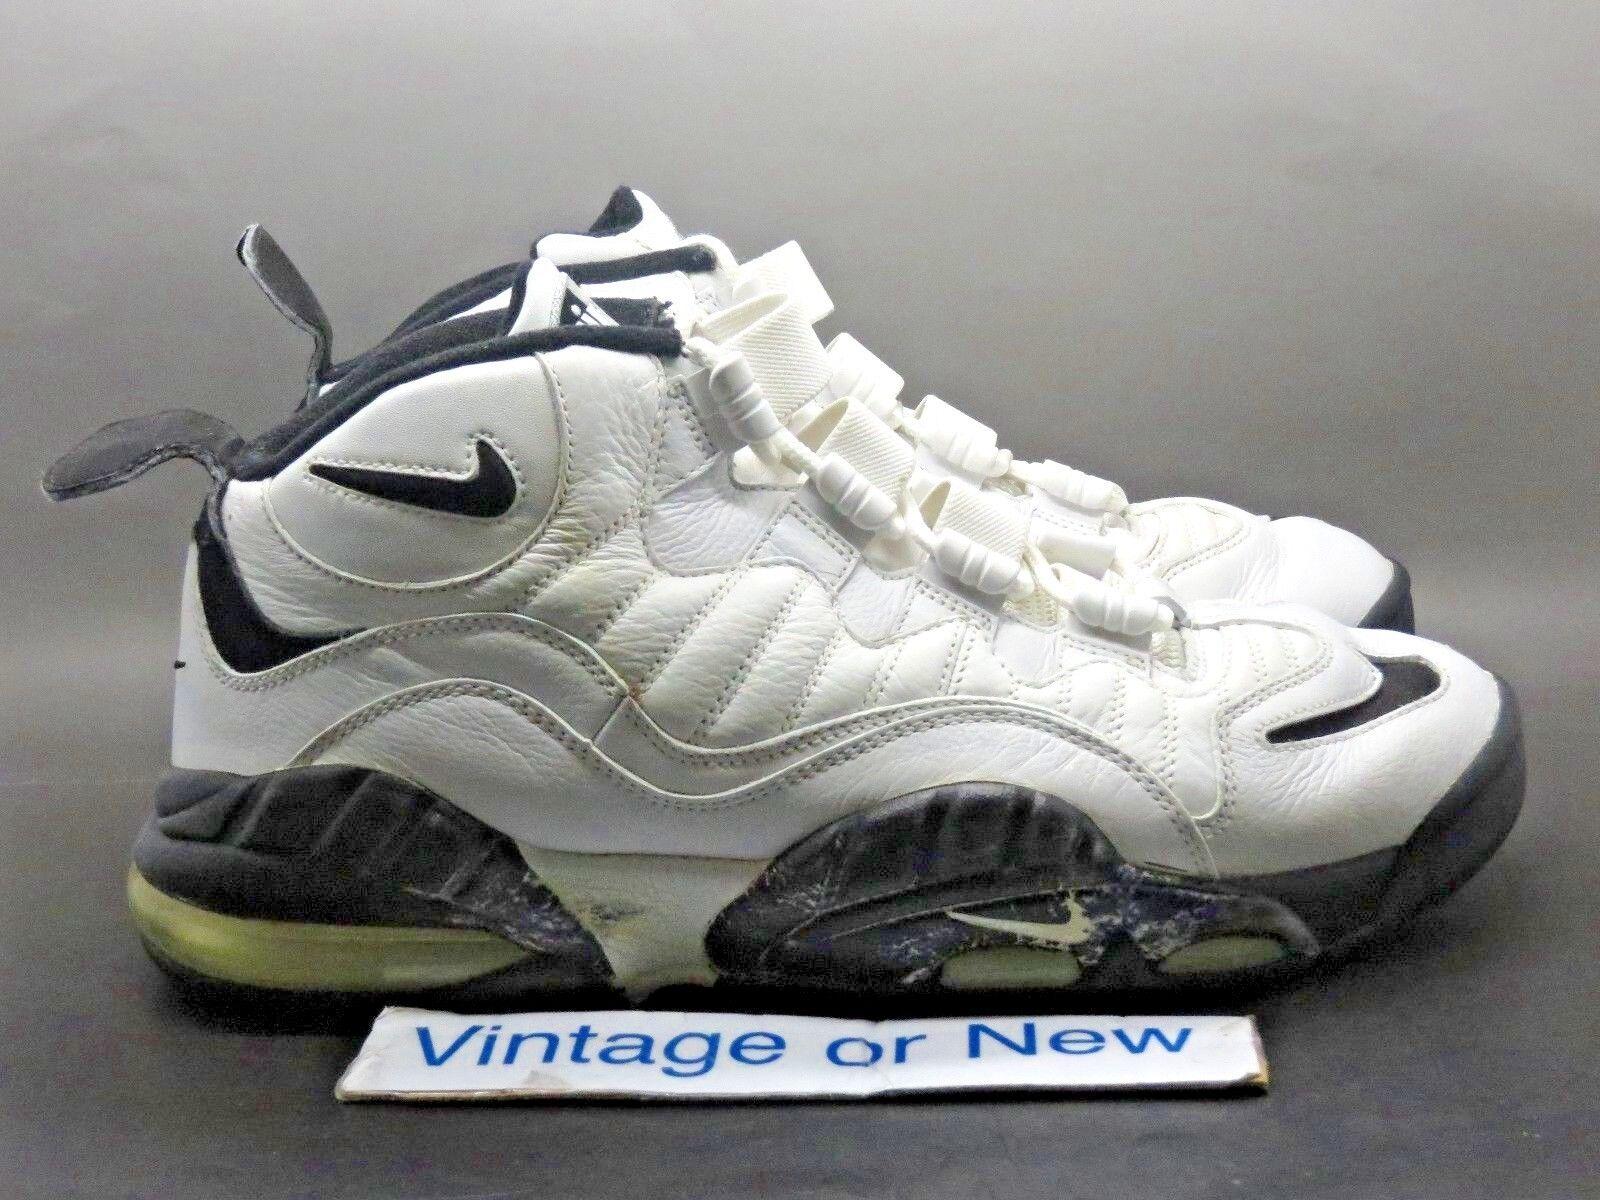 VTG Nike Air Max Senation White Black Chris Webber 2006 sz 9